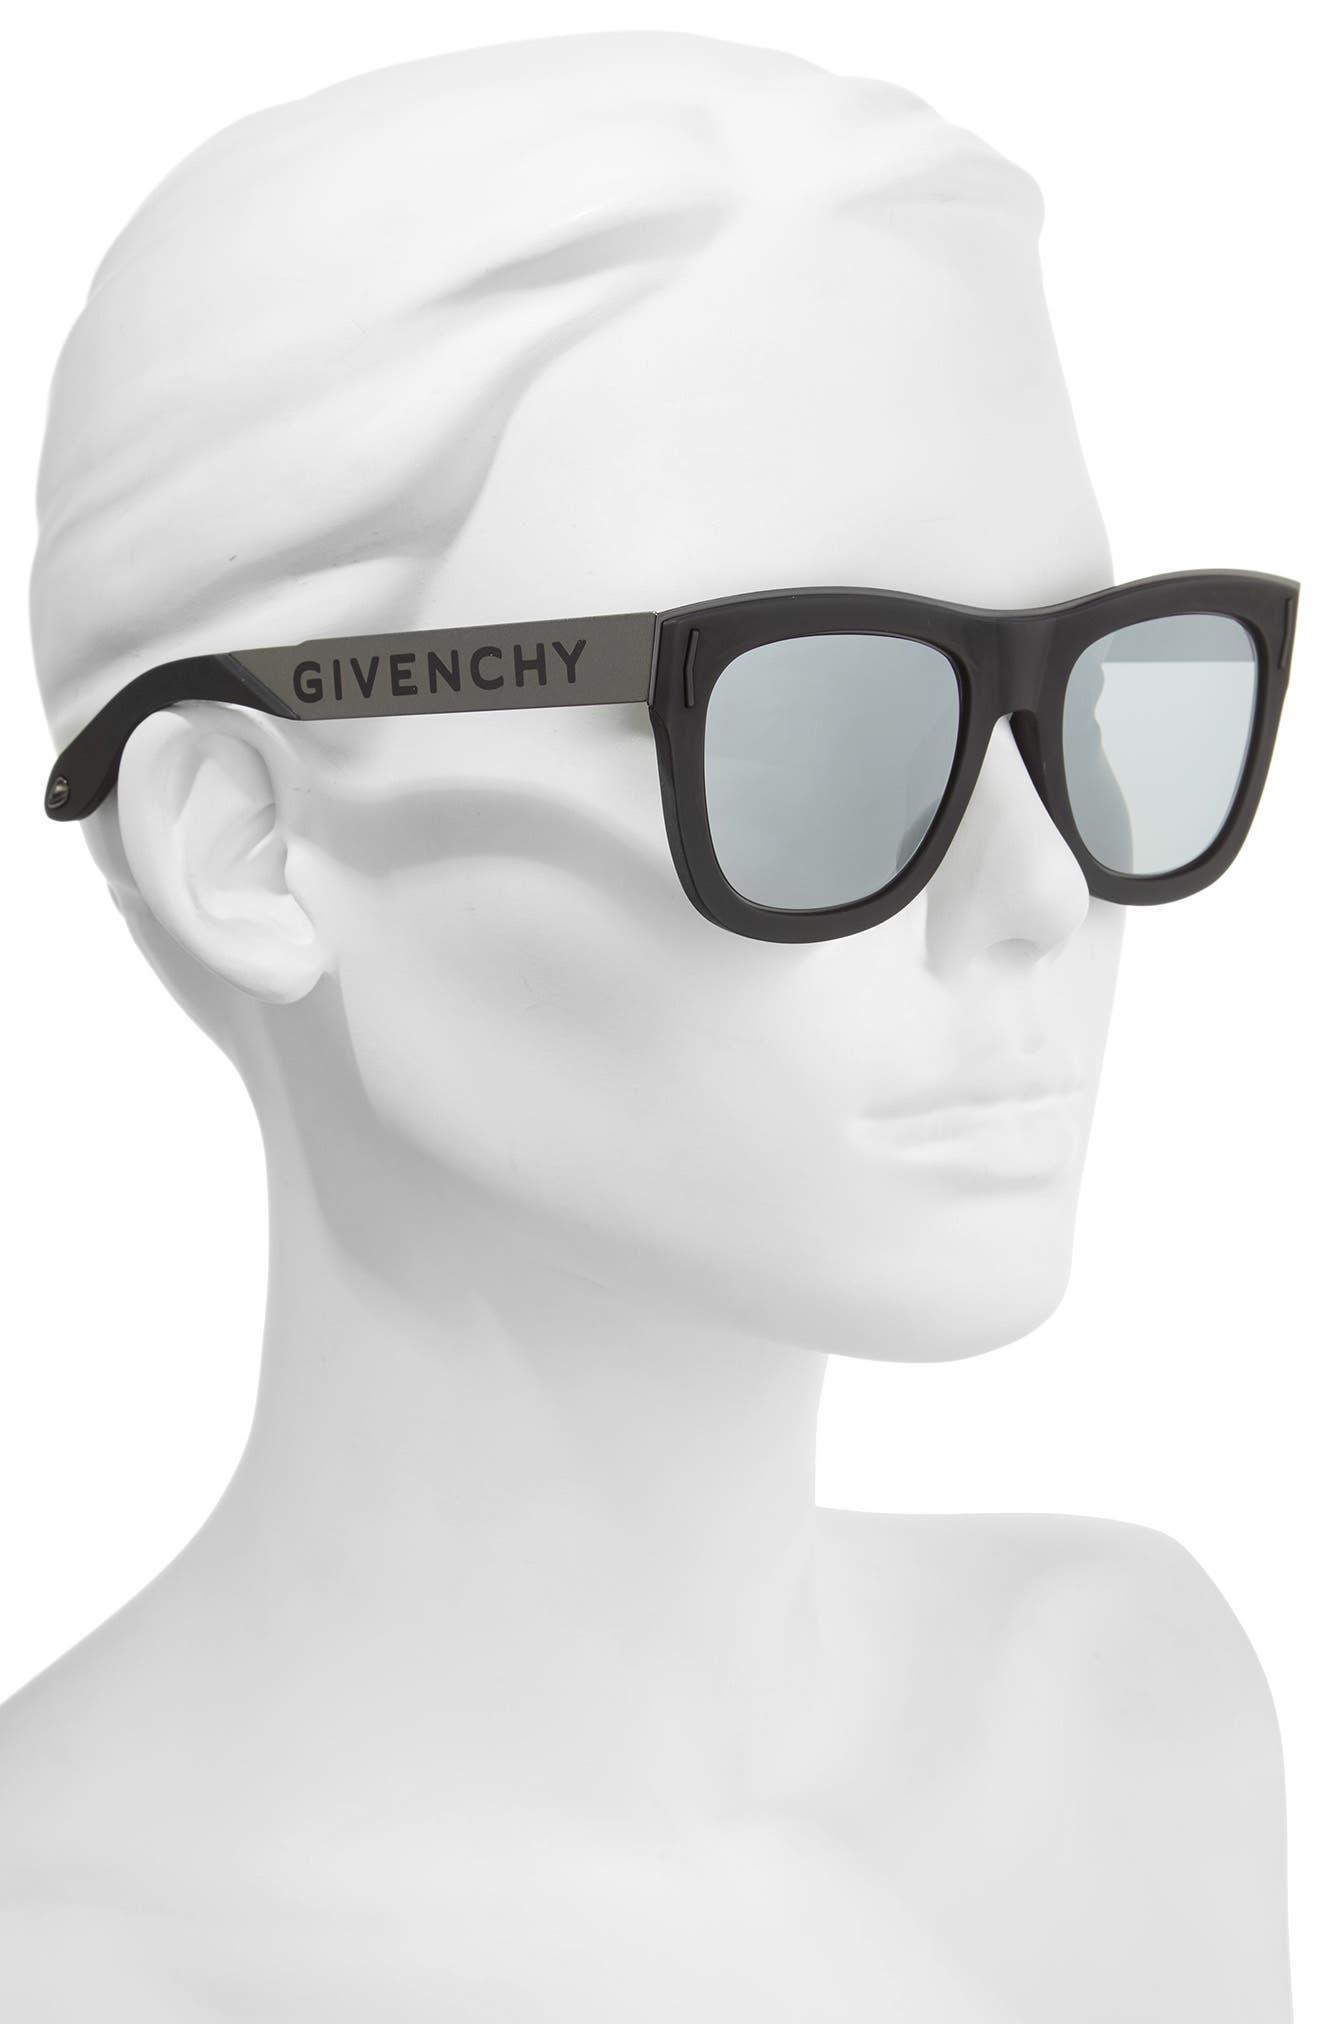 52mm Mirrored Rectangular Sunglasses,                             Alternate thumbnail 2, color,                             001